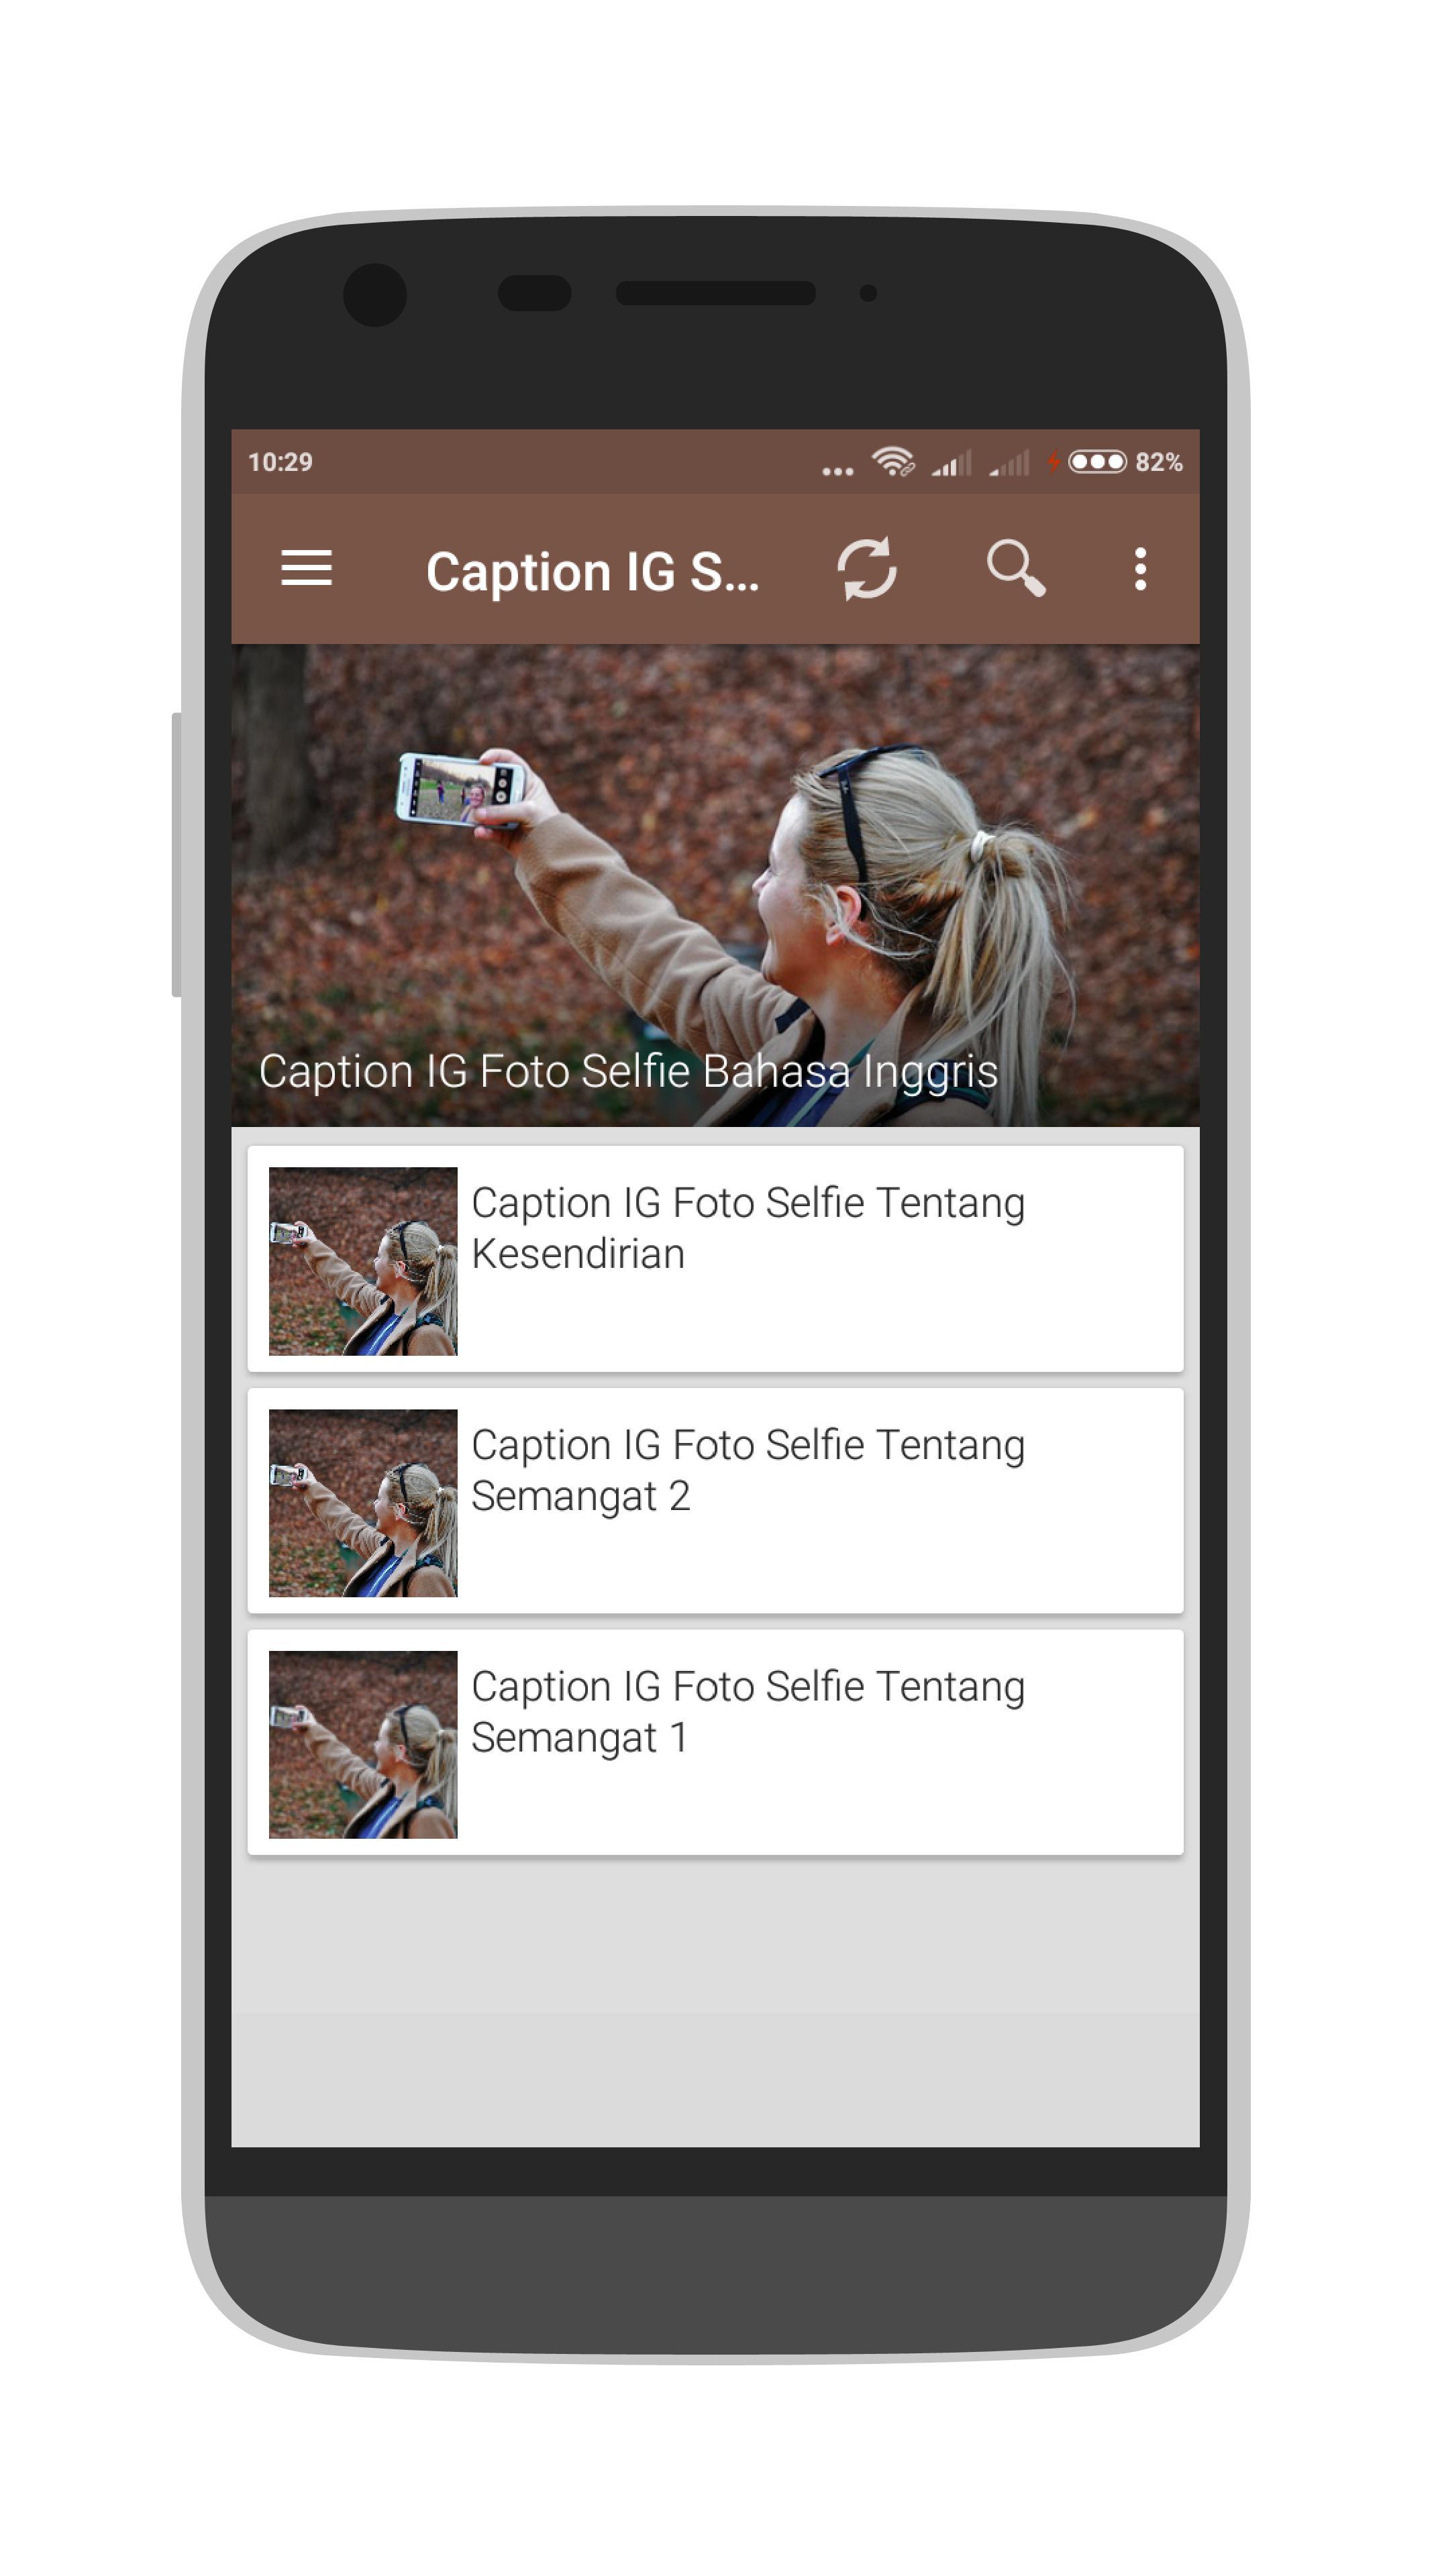 Caption IG Selfie For Android APK Download